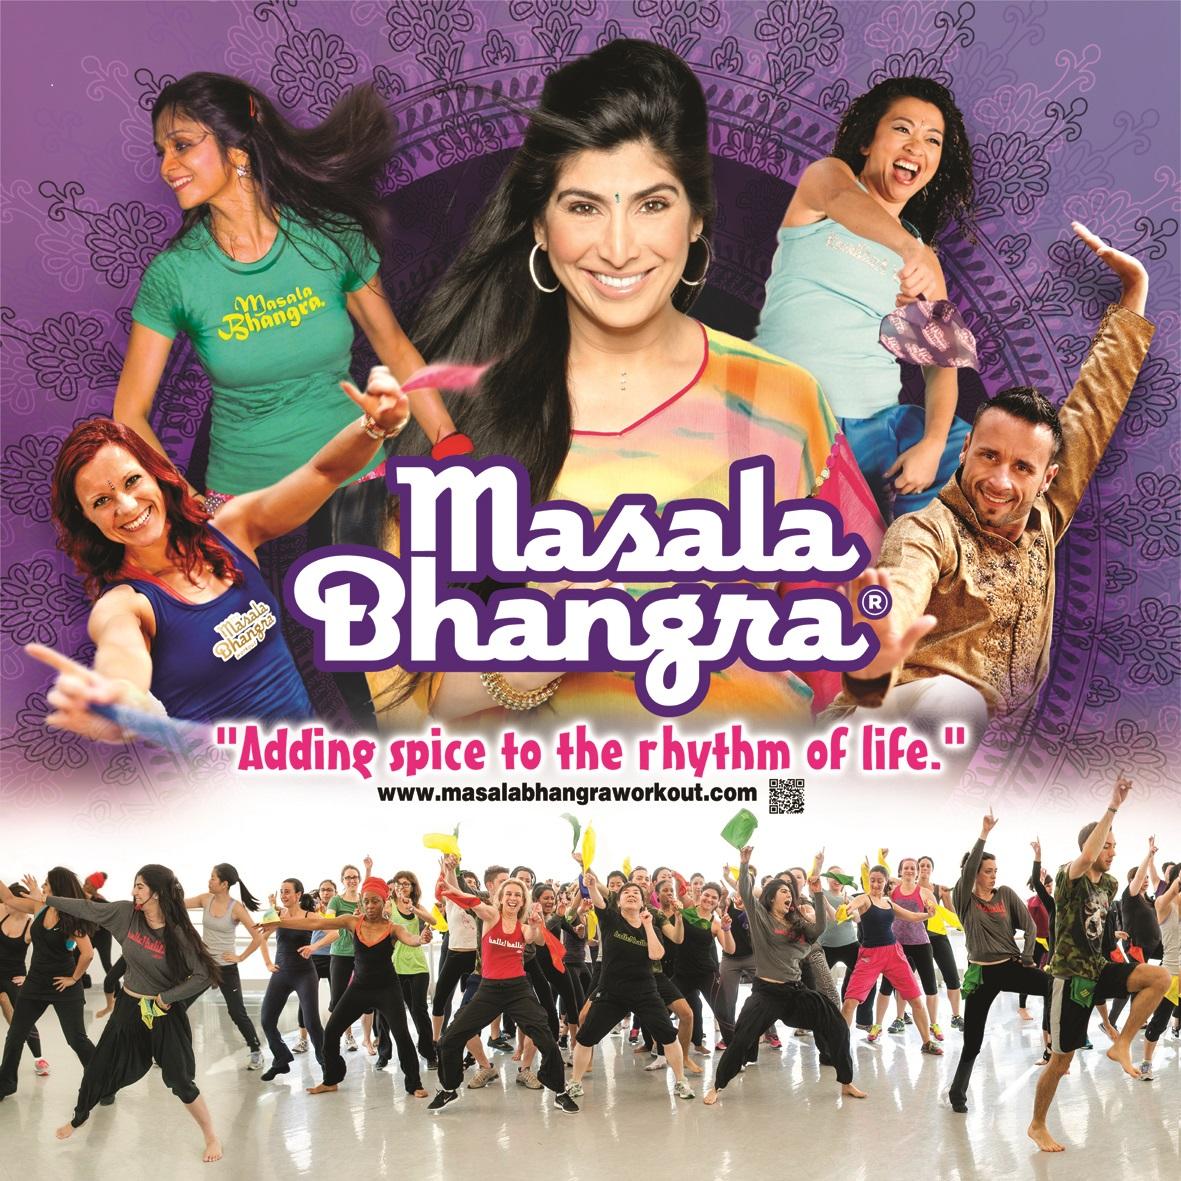 Watch We Did It: Masala Bhangra video